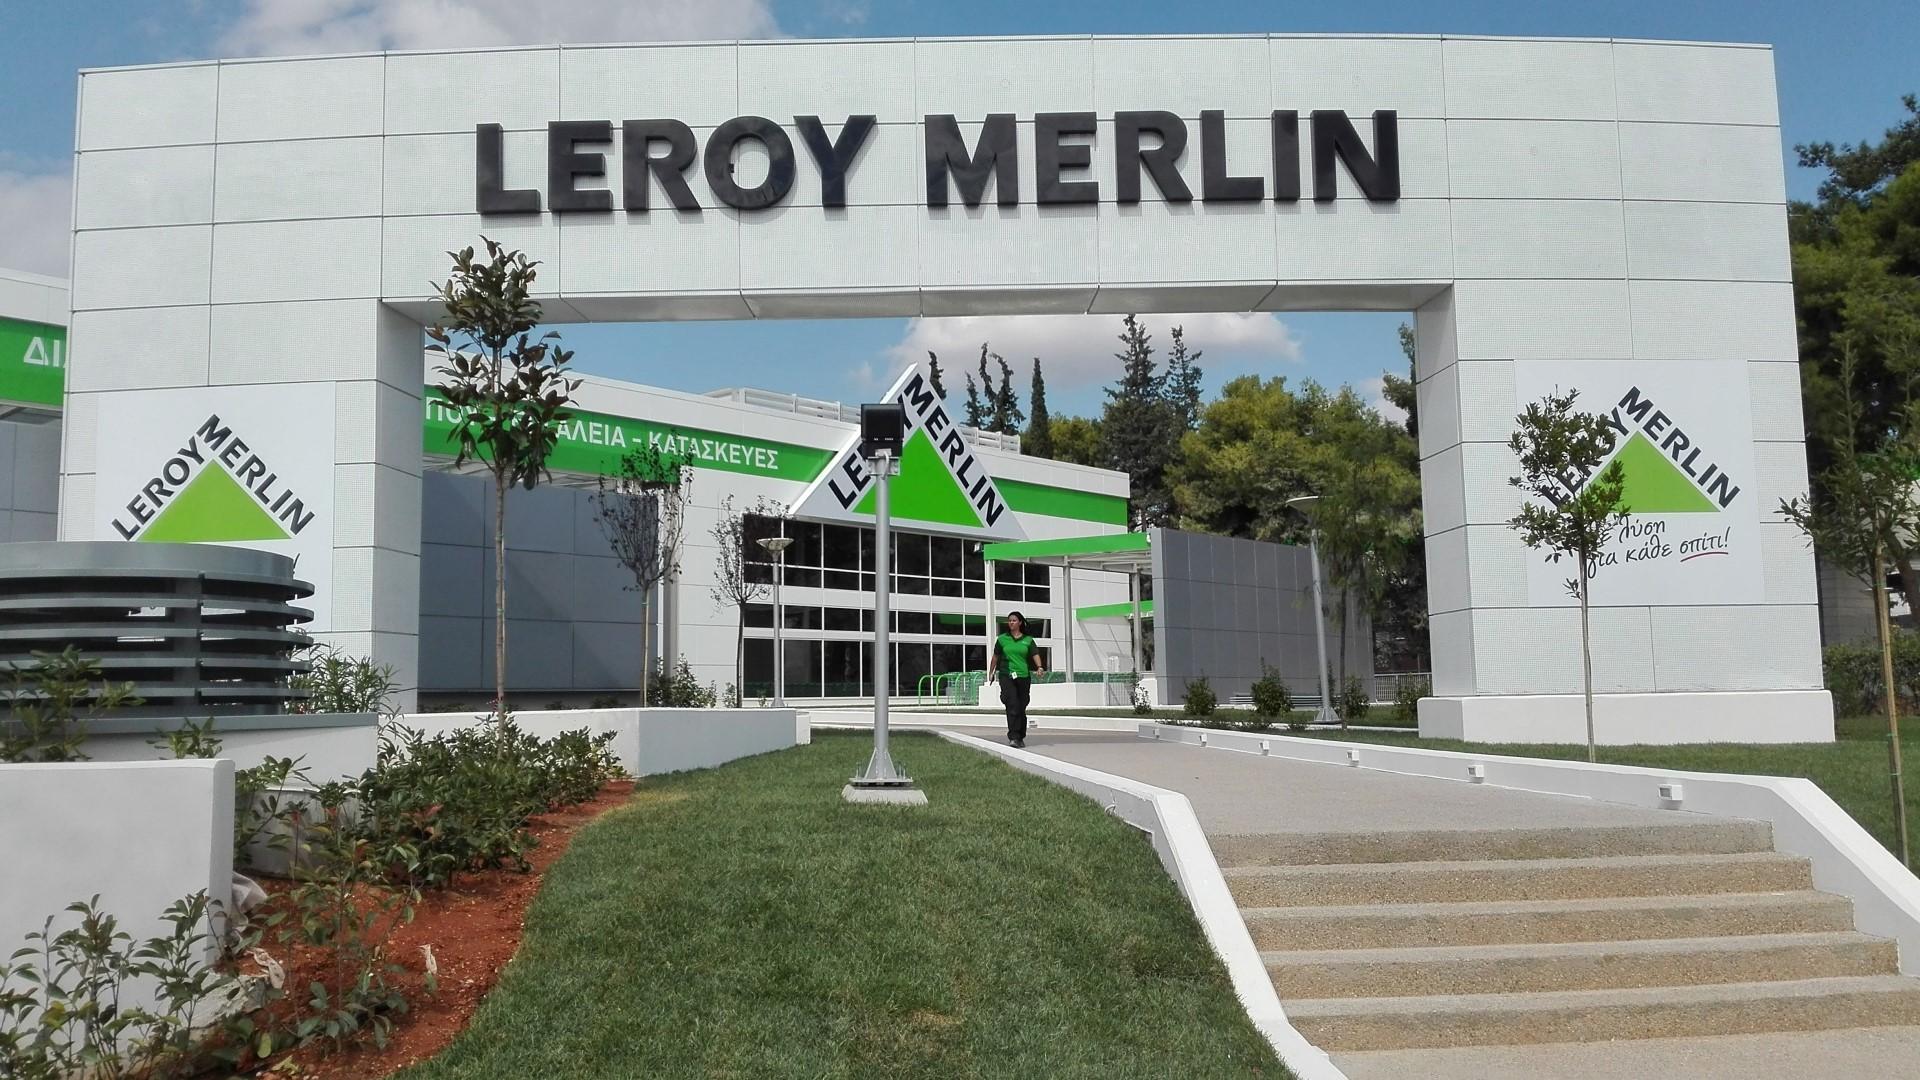 leroy-merlin-dachtilidi-3-large